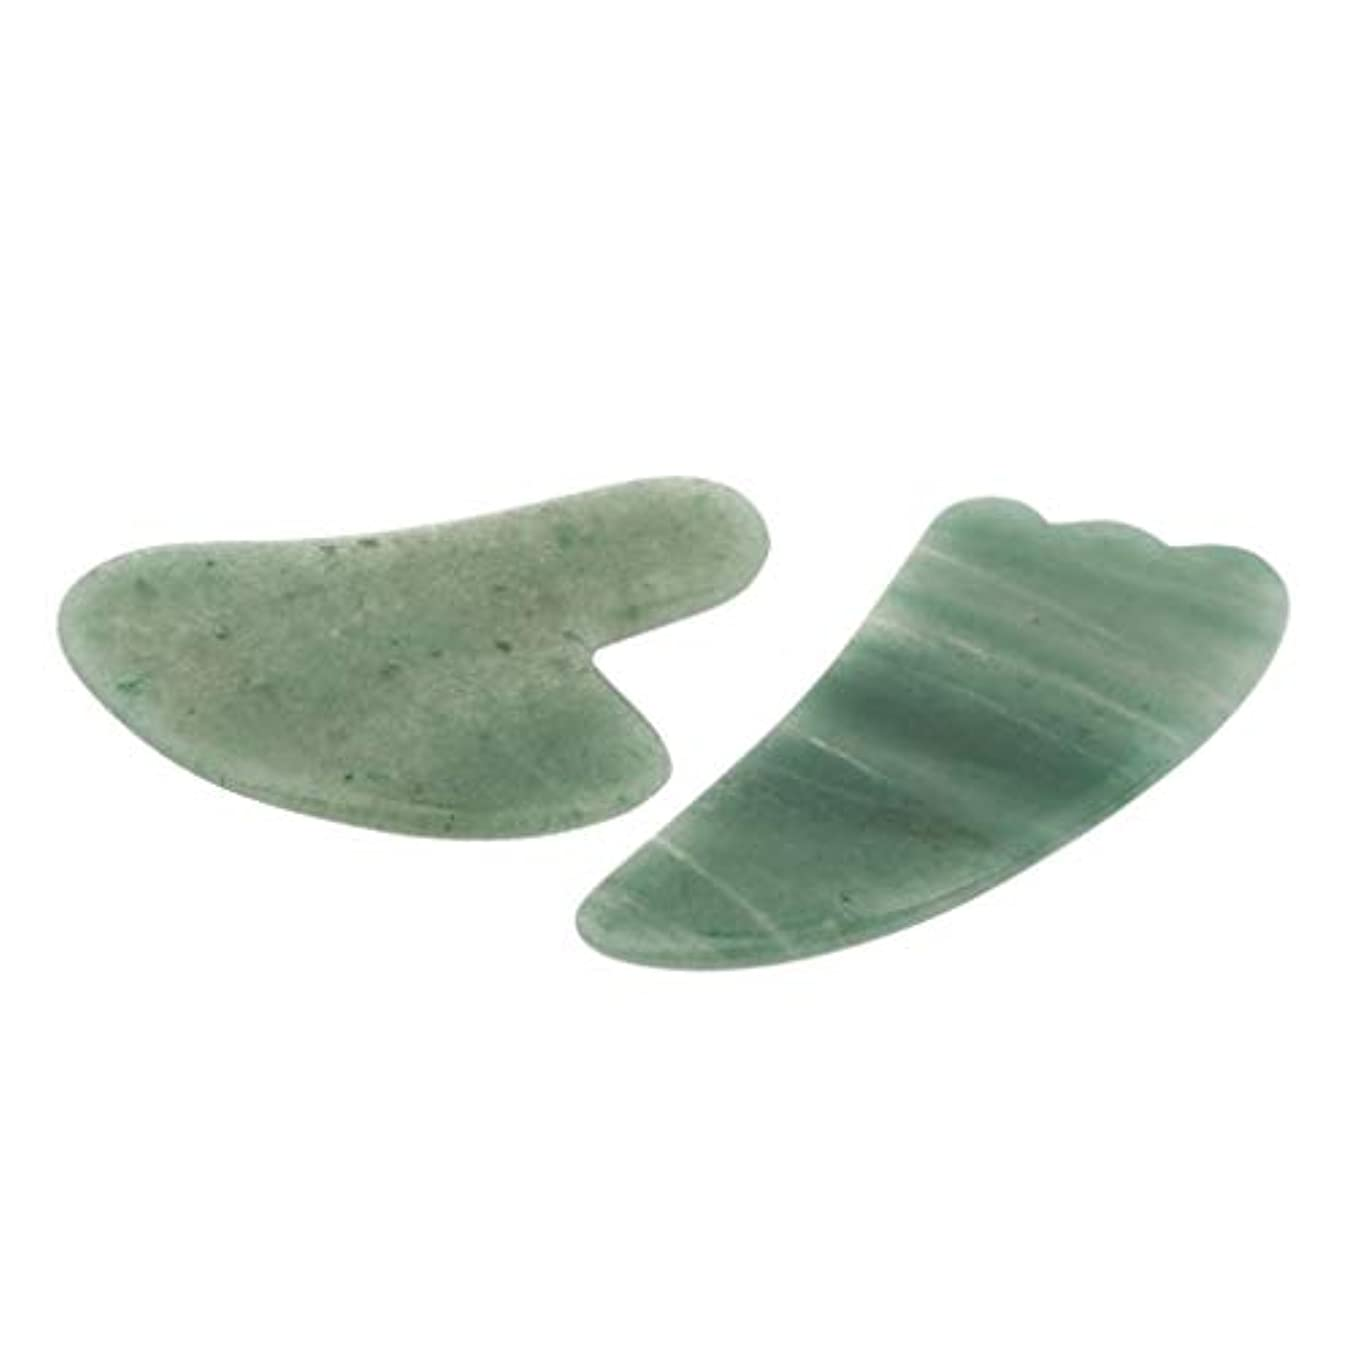 Baoblaze カッサ板 かっさプレート 天然石 翡翠 カッサボード マッサージストーン 羽型 2個